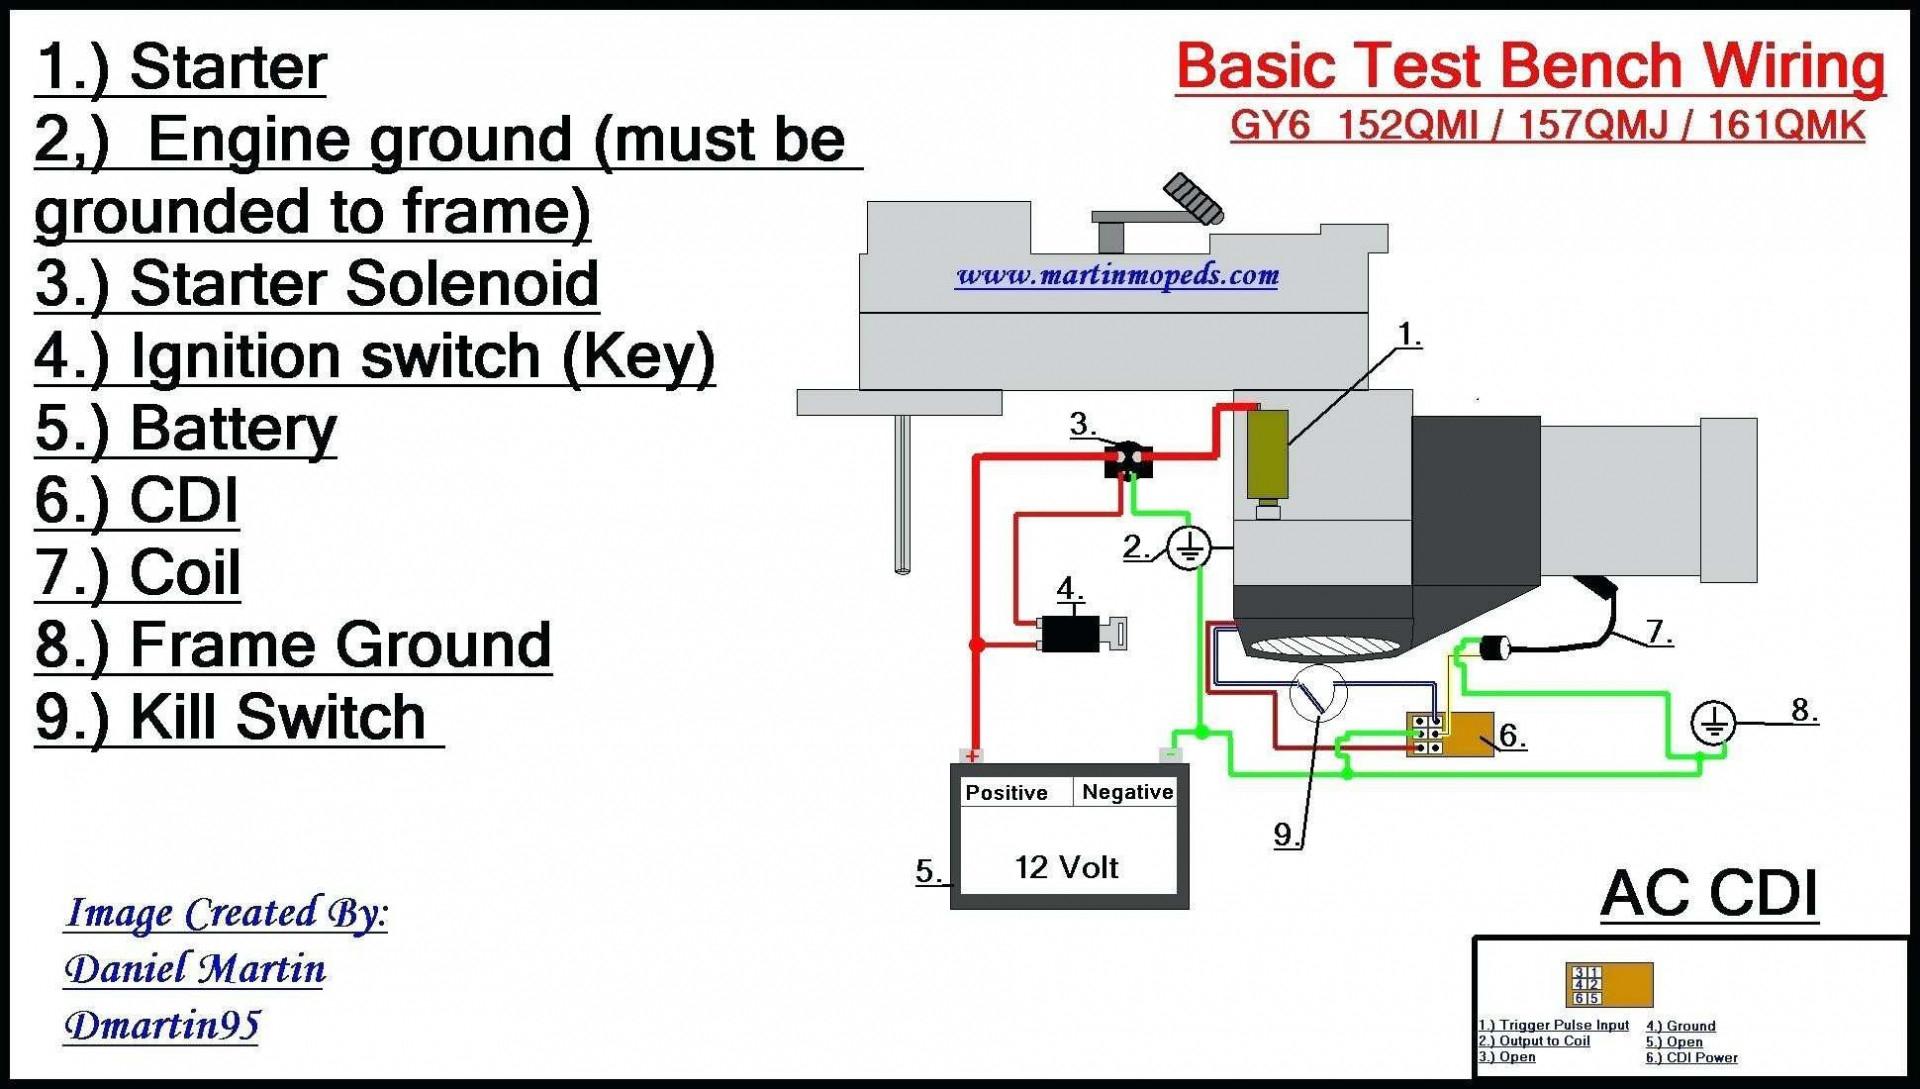 12 Volt Solenoid Wiring Diagram Wiring Diagram Collections - Wiring - 12V Starter Solenoid Wiring Diagram